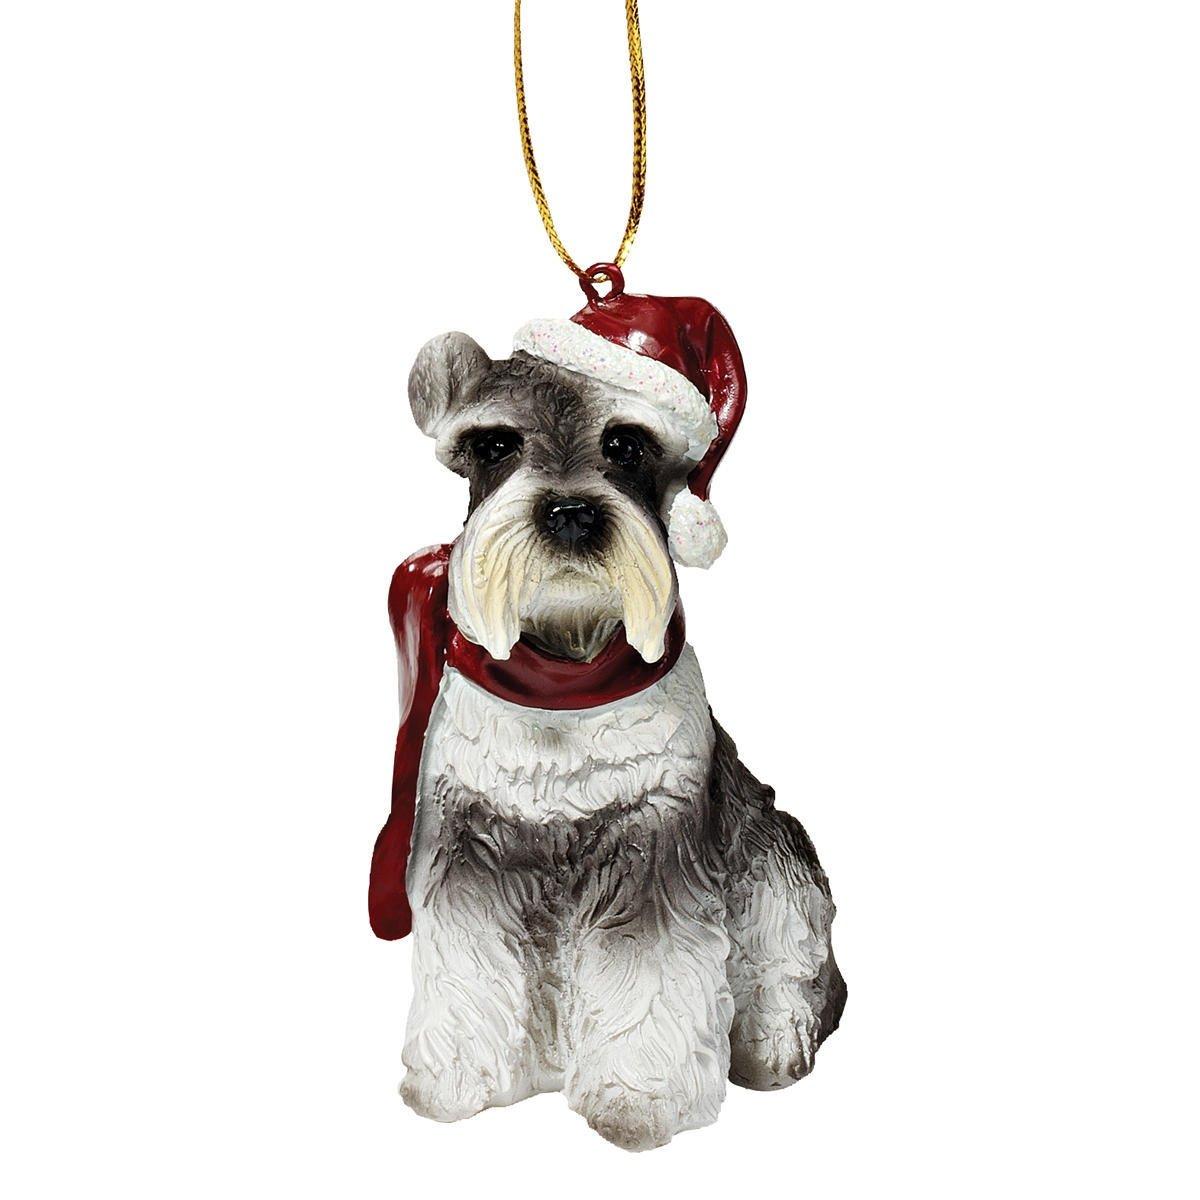 Amazon.com: Design Toscano Christmas Ornaments - Xmas Miniature ...